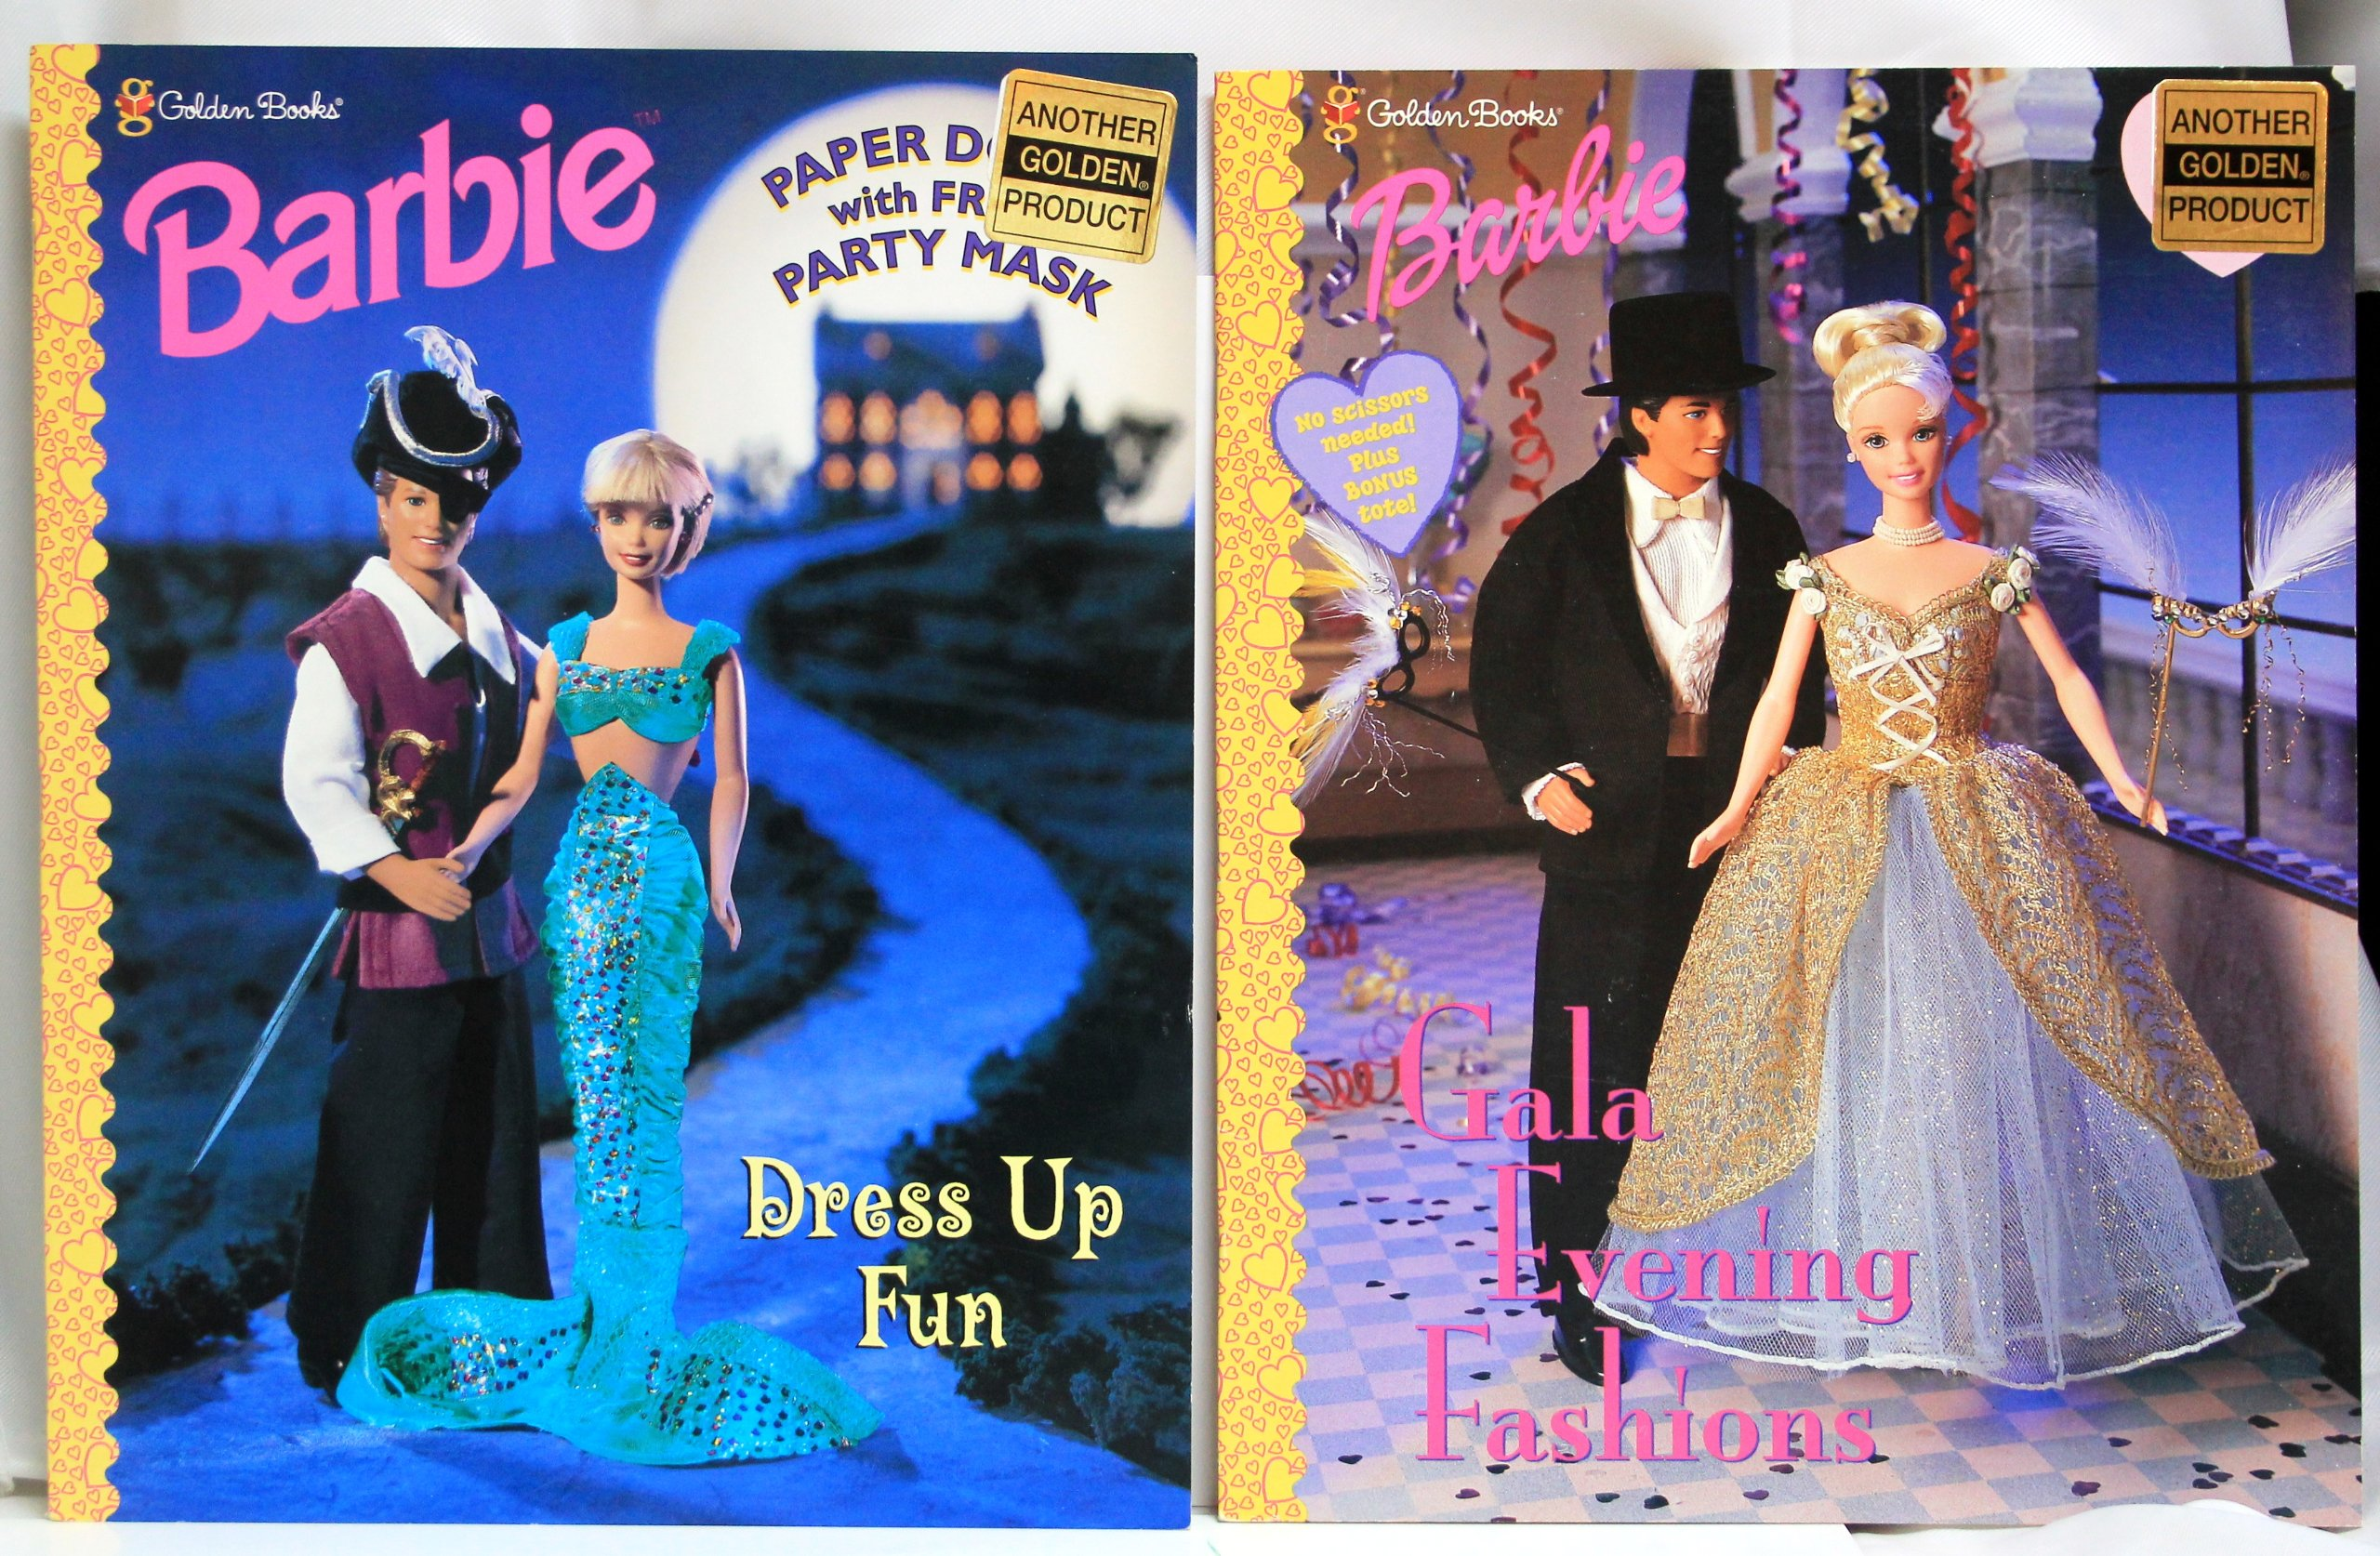 Golden Books Ken & Barbie Paper Doll Collection - Dress Up Costume ...